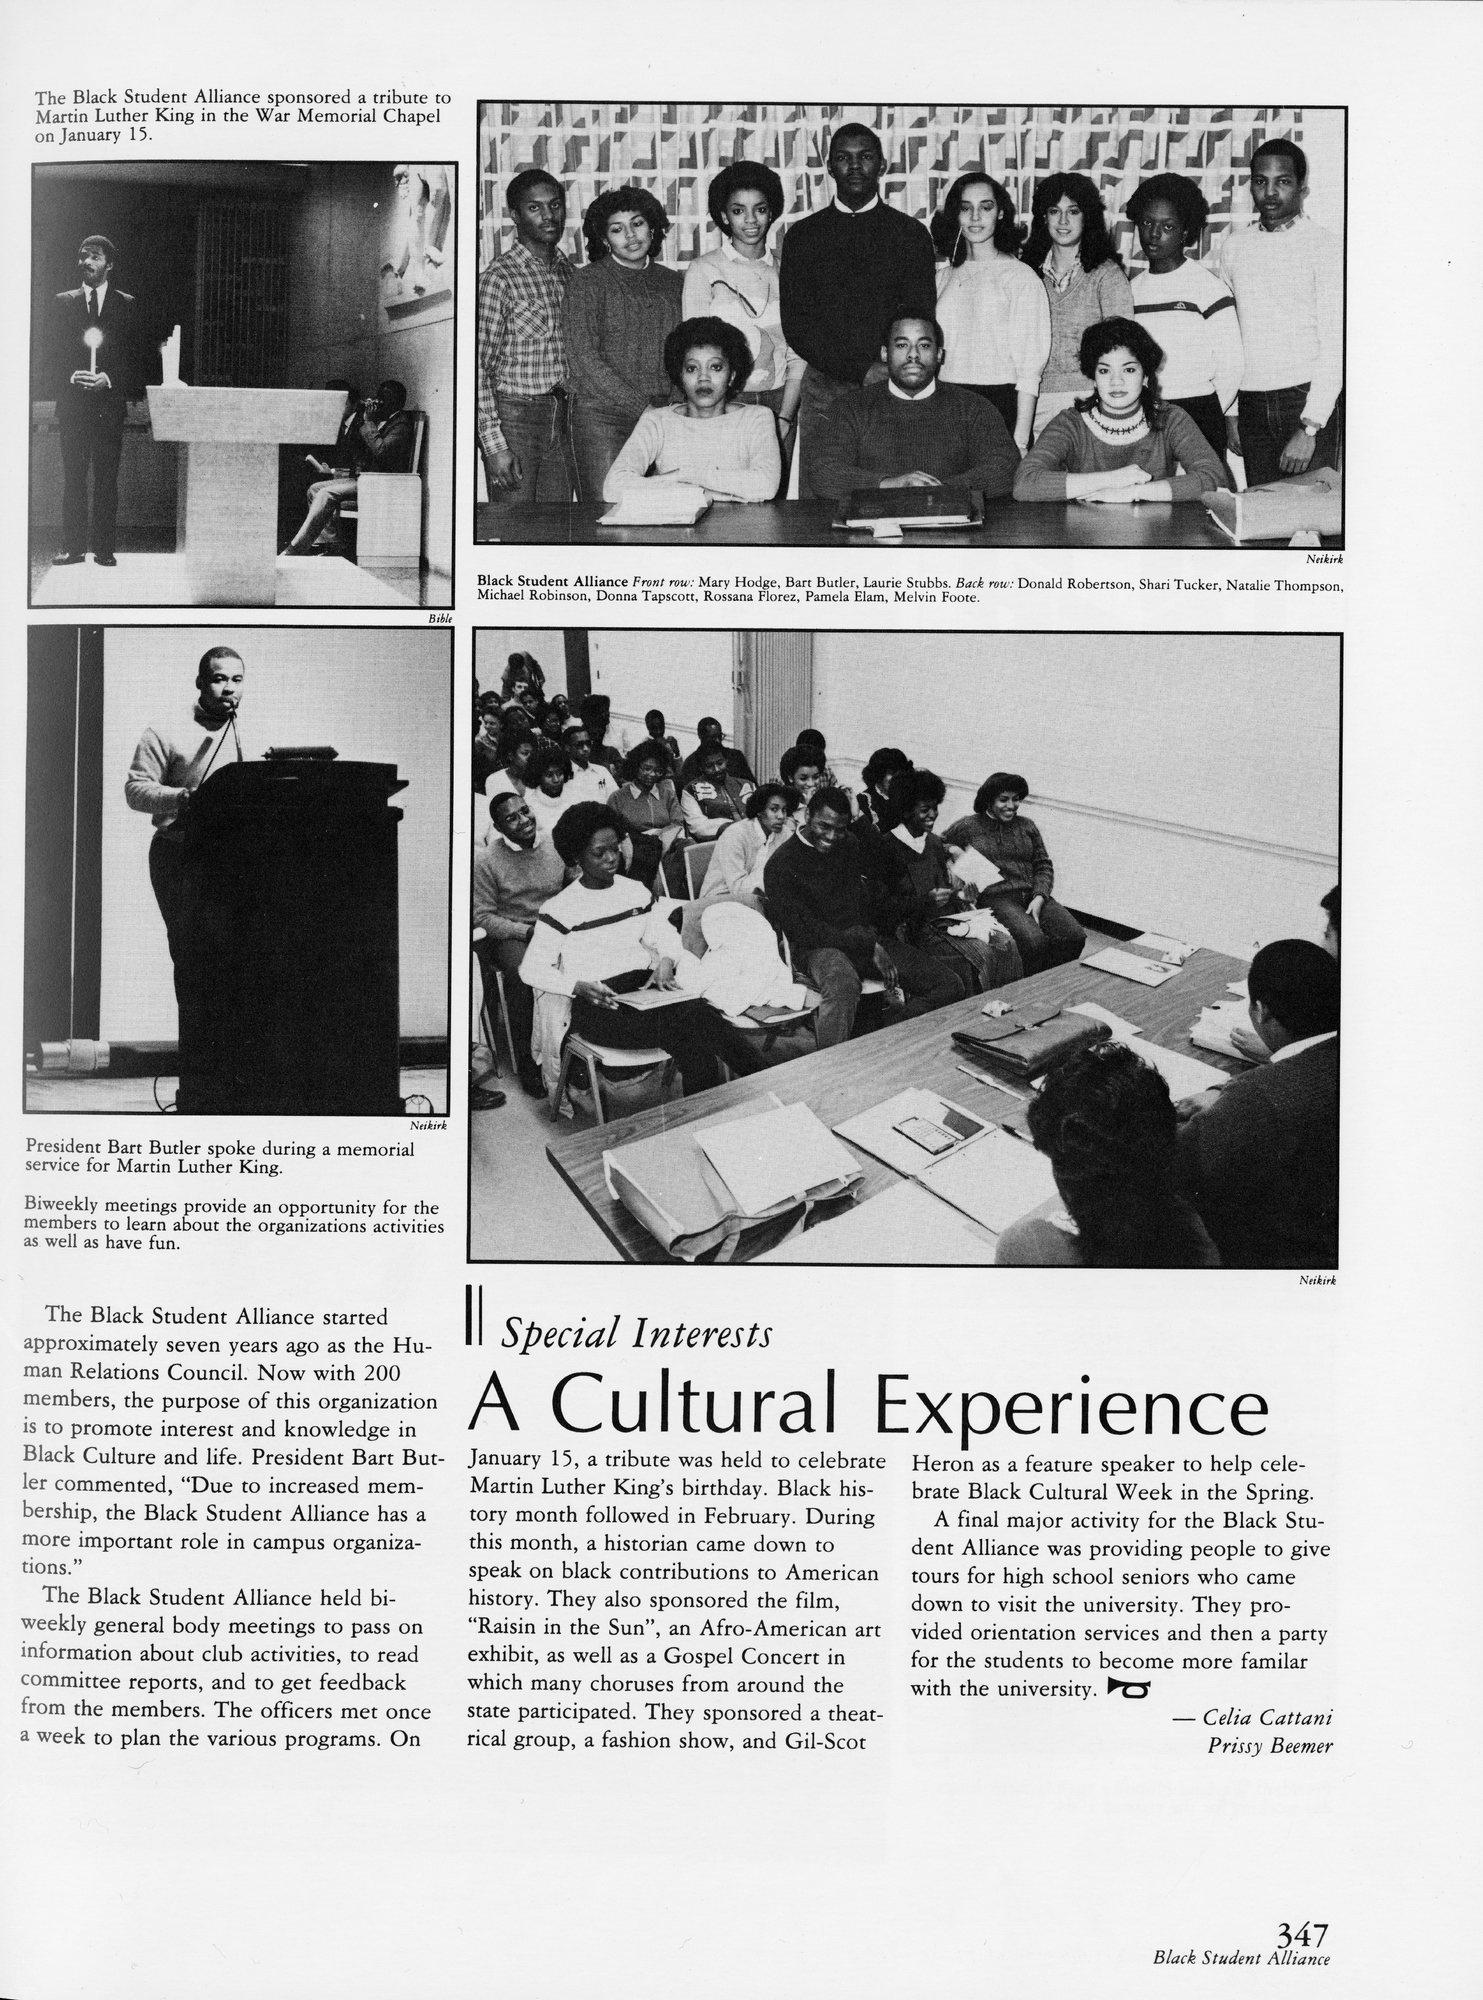 http://spec.lib.vt.edu/pickup/Omeka_upload/BSA_1983Bugle_pg347.jpg